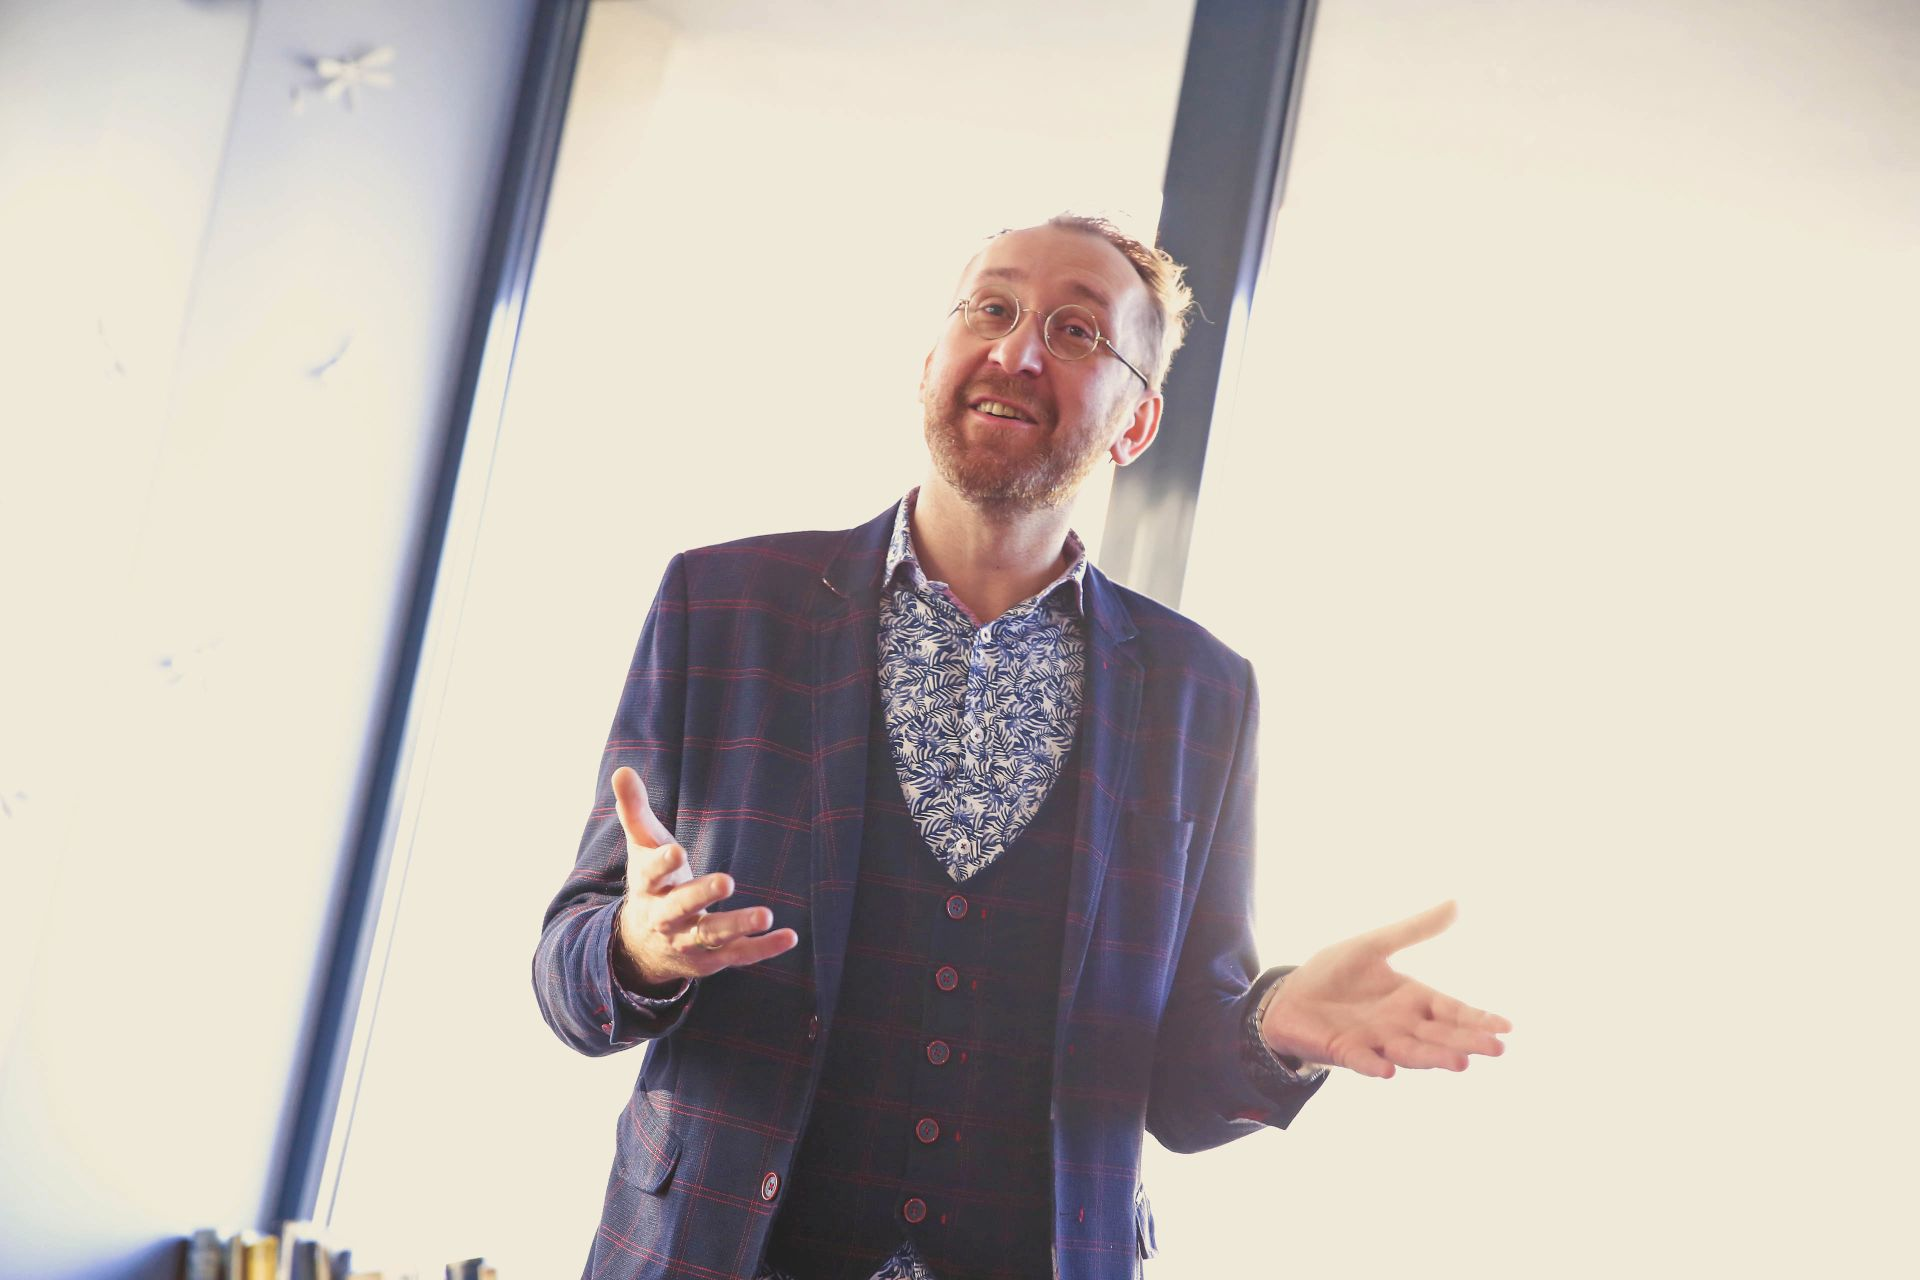 Christian Pomper, Genossenshafts-Experte